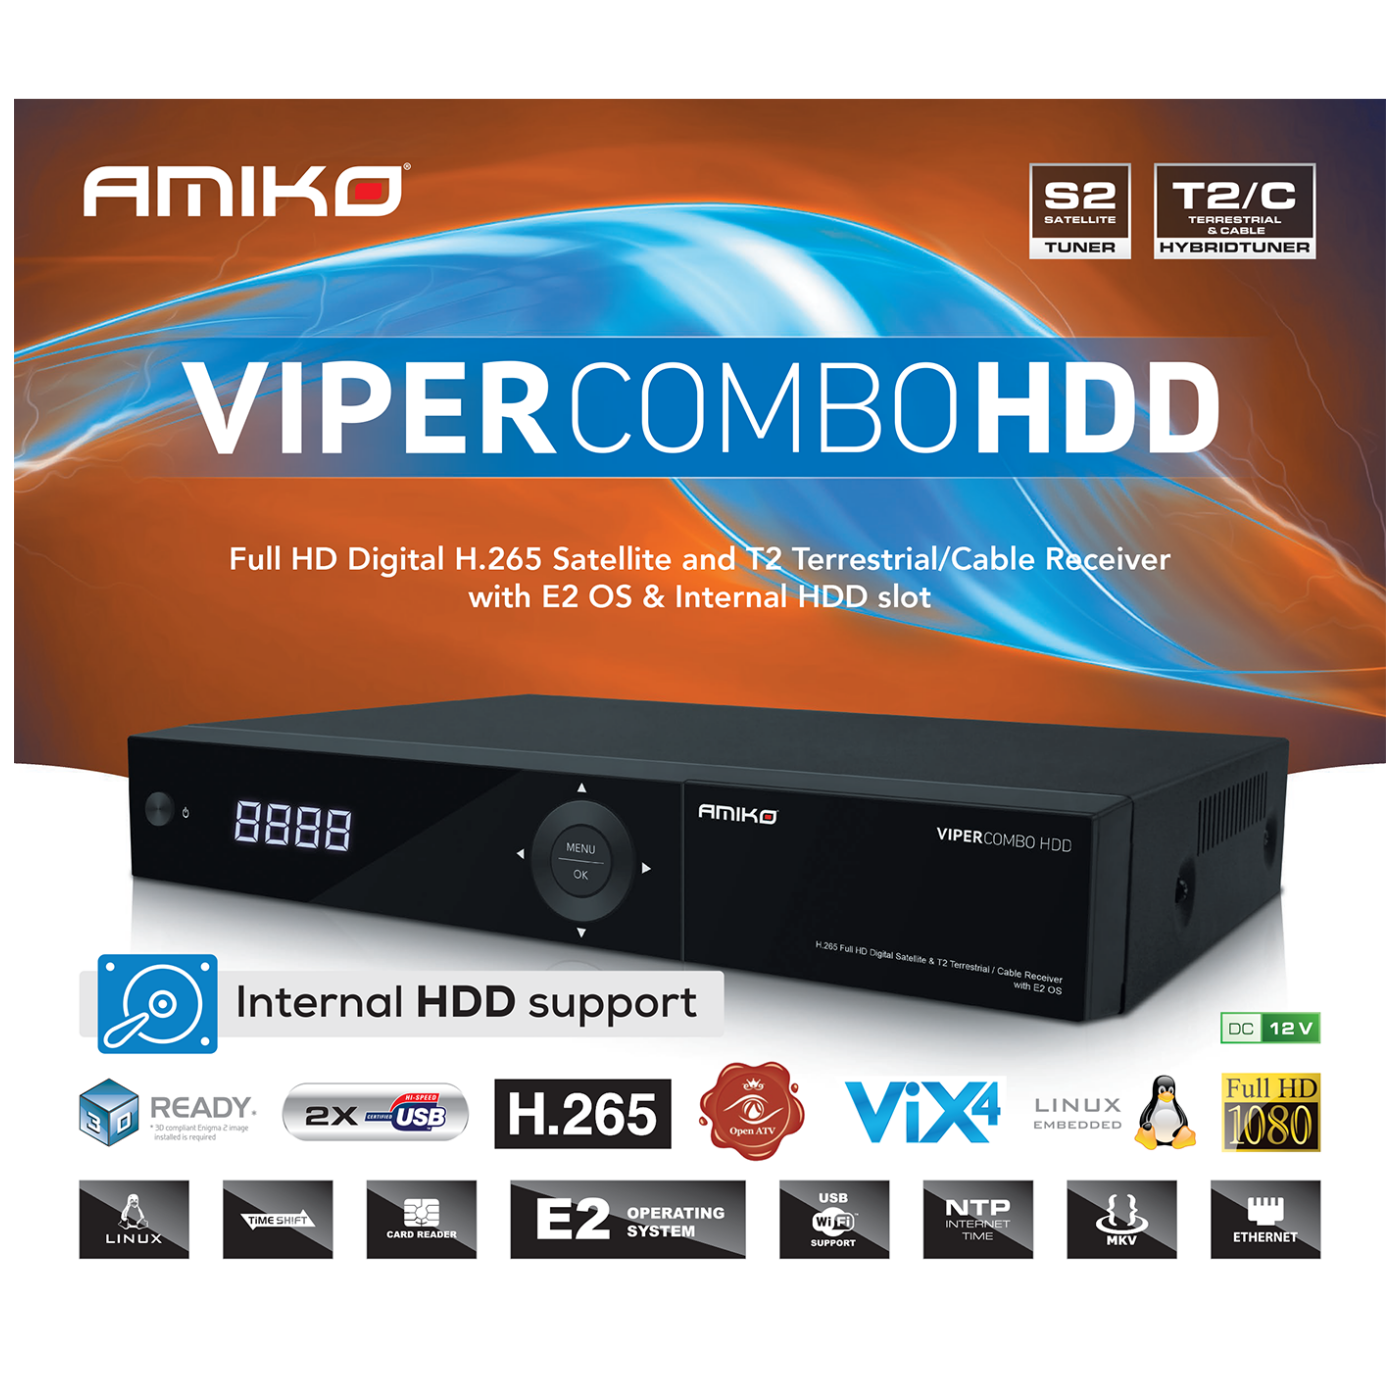 VIPER Combo HDD